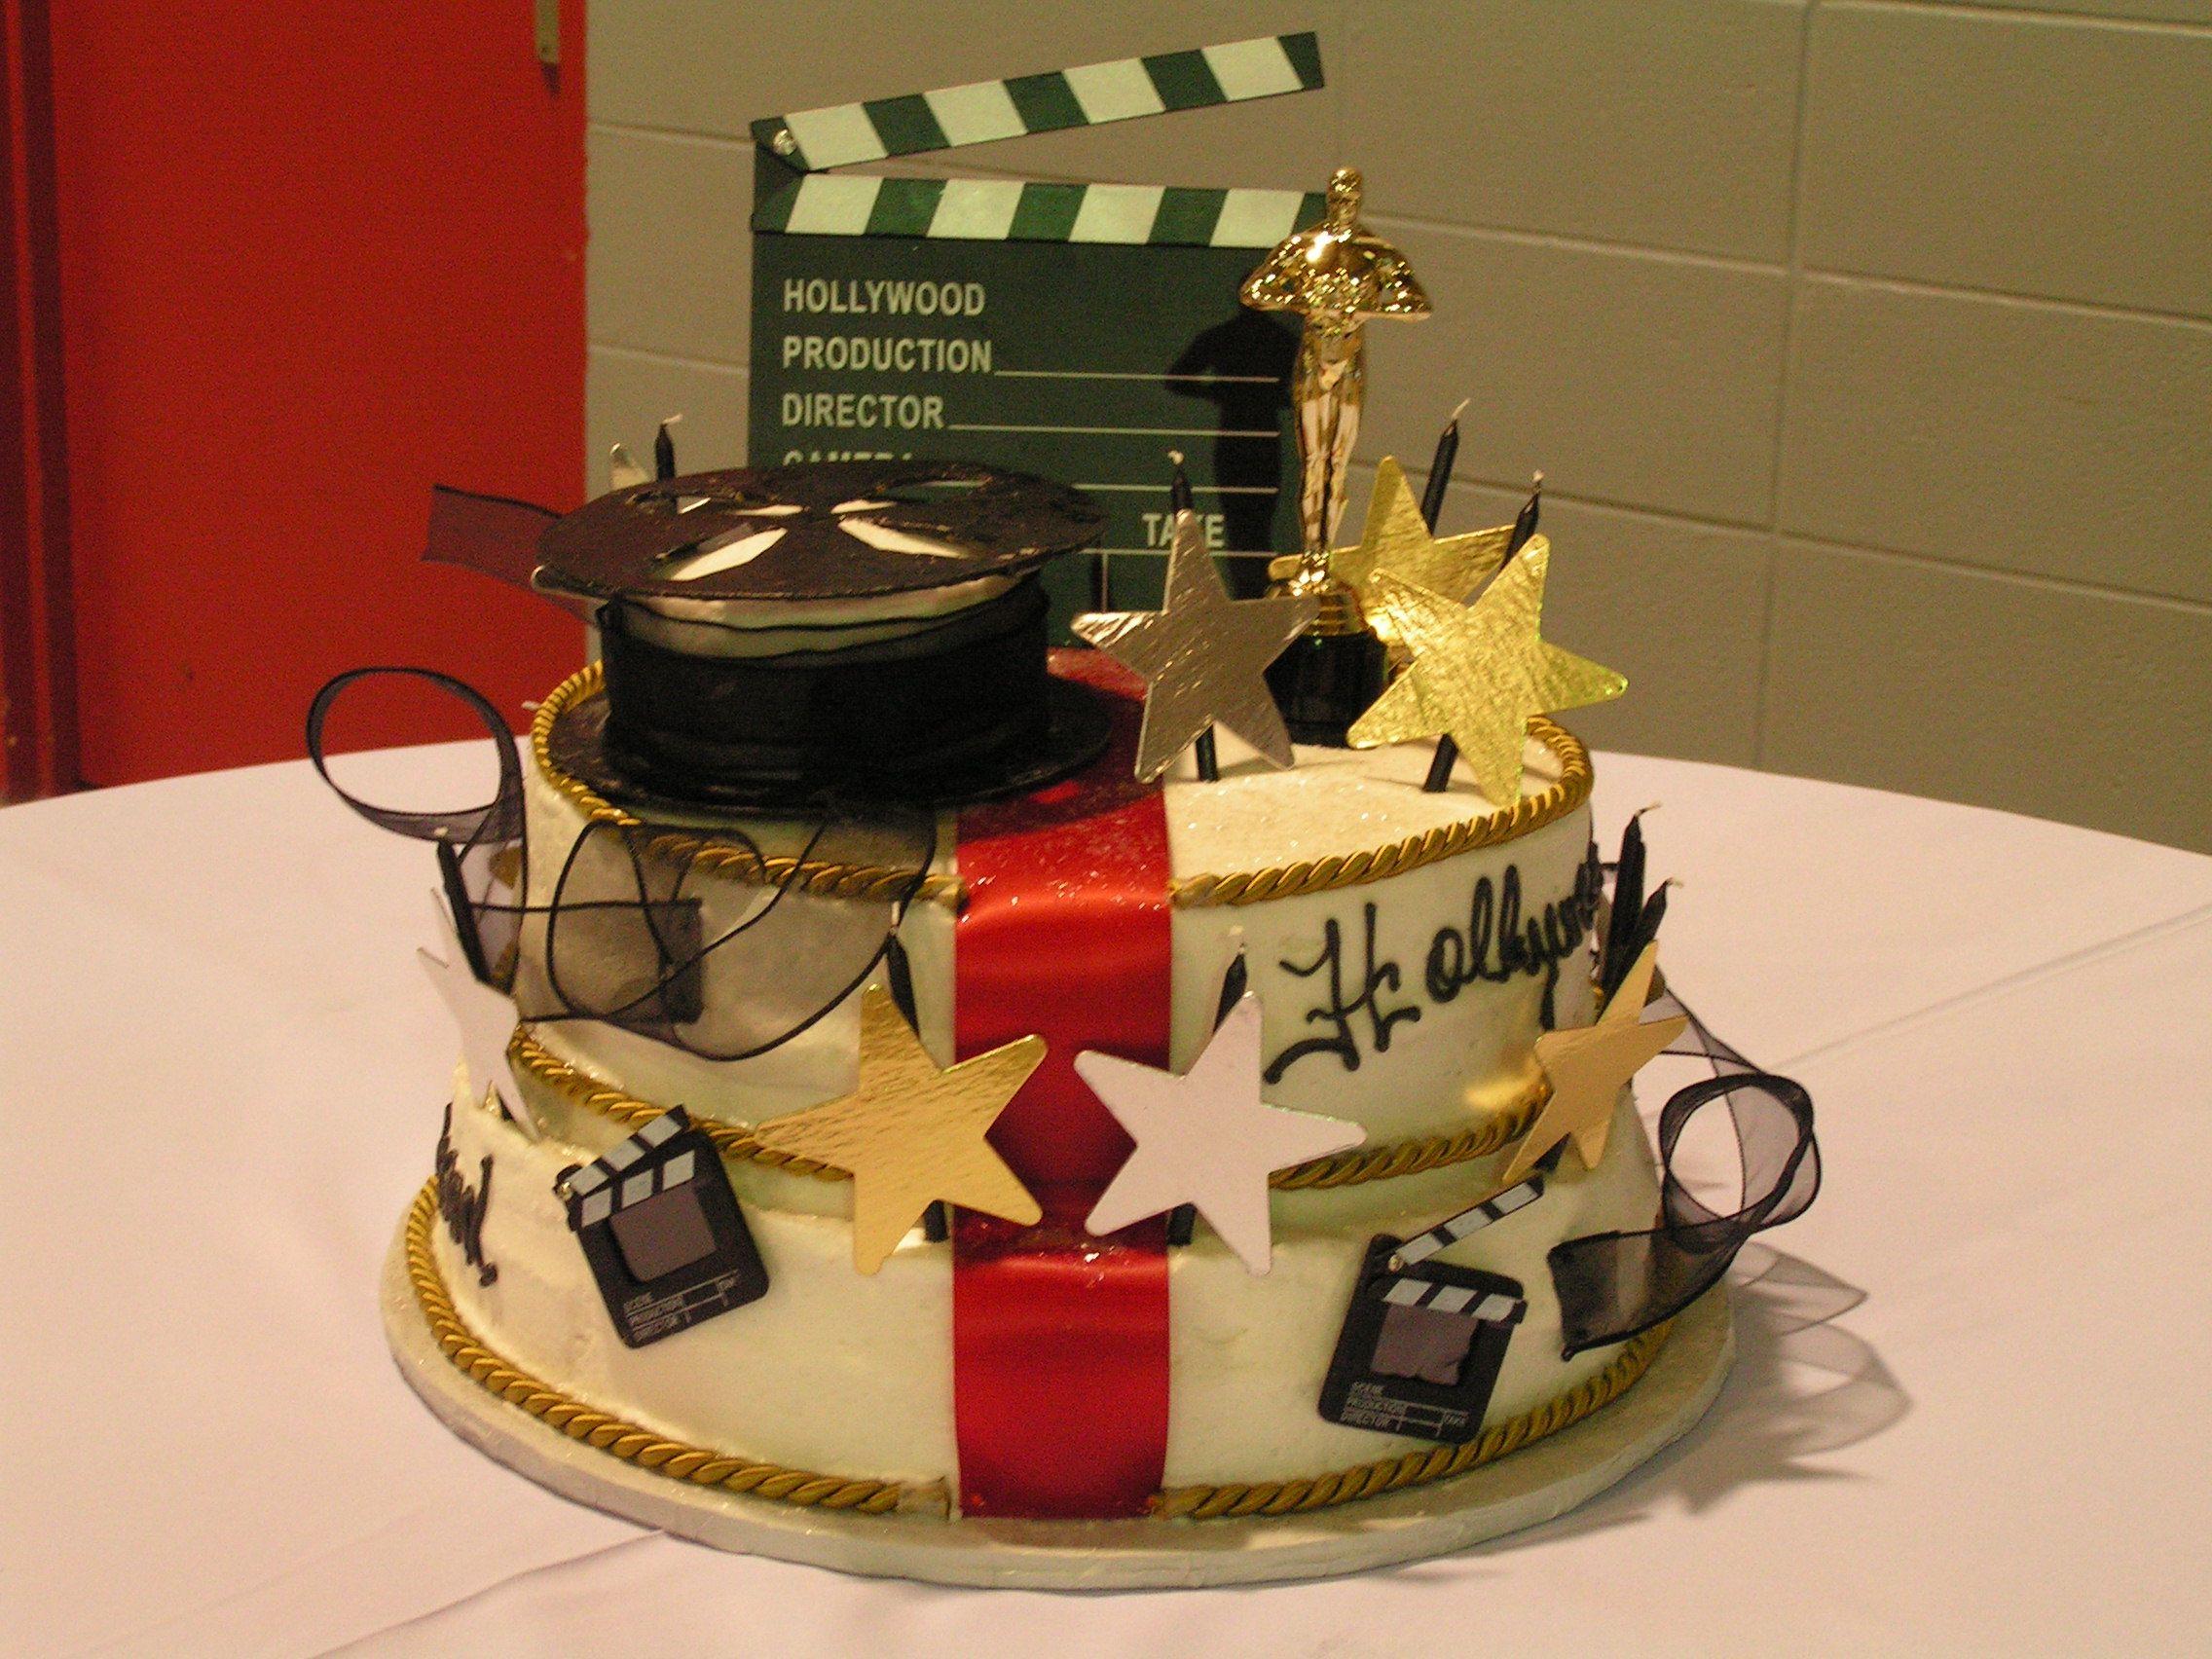 Hollywood Theme Birthday Cake Cakes By Corrie Pinterest - Movie themed birthday cake